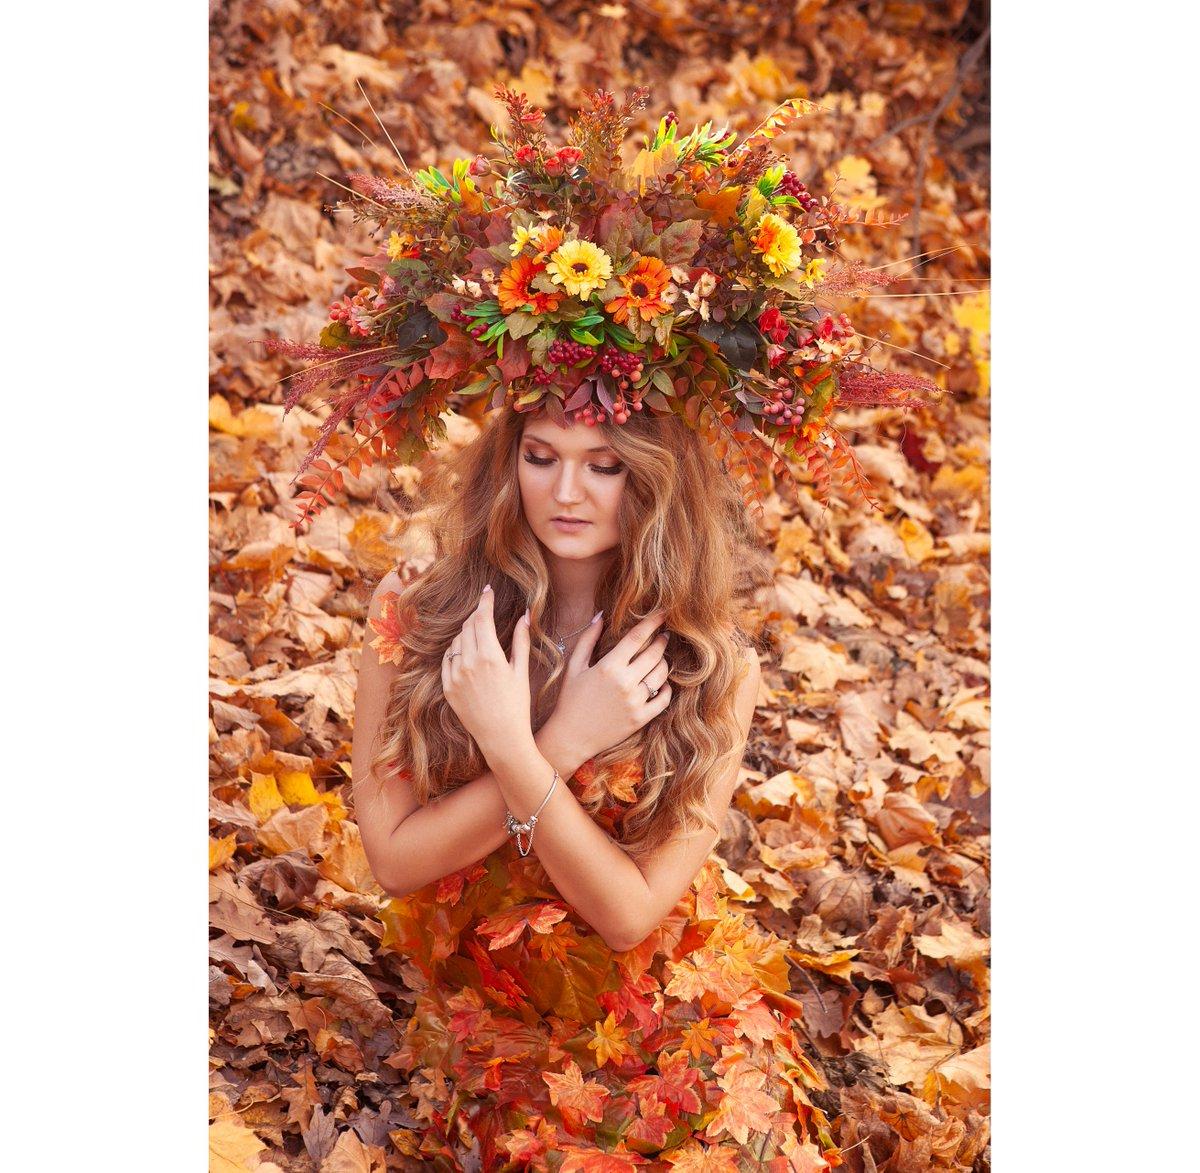 Autumn photo edited.  #autumn #autumncolors #autumnleaves #autumnvibes #autumnmood #autumnweather #Autumn2020 #autumncolours #autumnstyle #autumntime #autumnfashion #autumnoutfit #autumnishere #autumnday #autumnlove  #autumnsky #autumnphotography #autumndecor #autumnnailspic.twitter.com/plNdqZK5U7